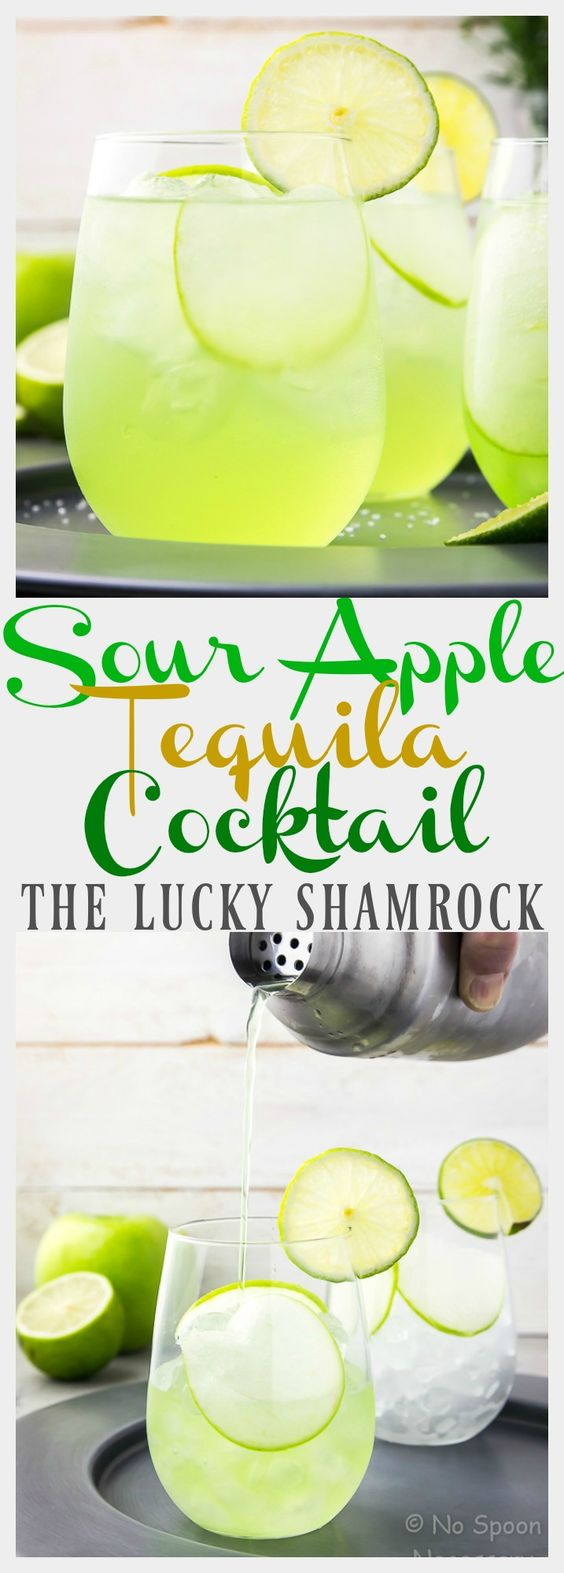 Sour Apple Tequila Cocktail